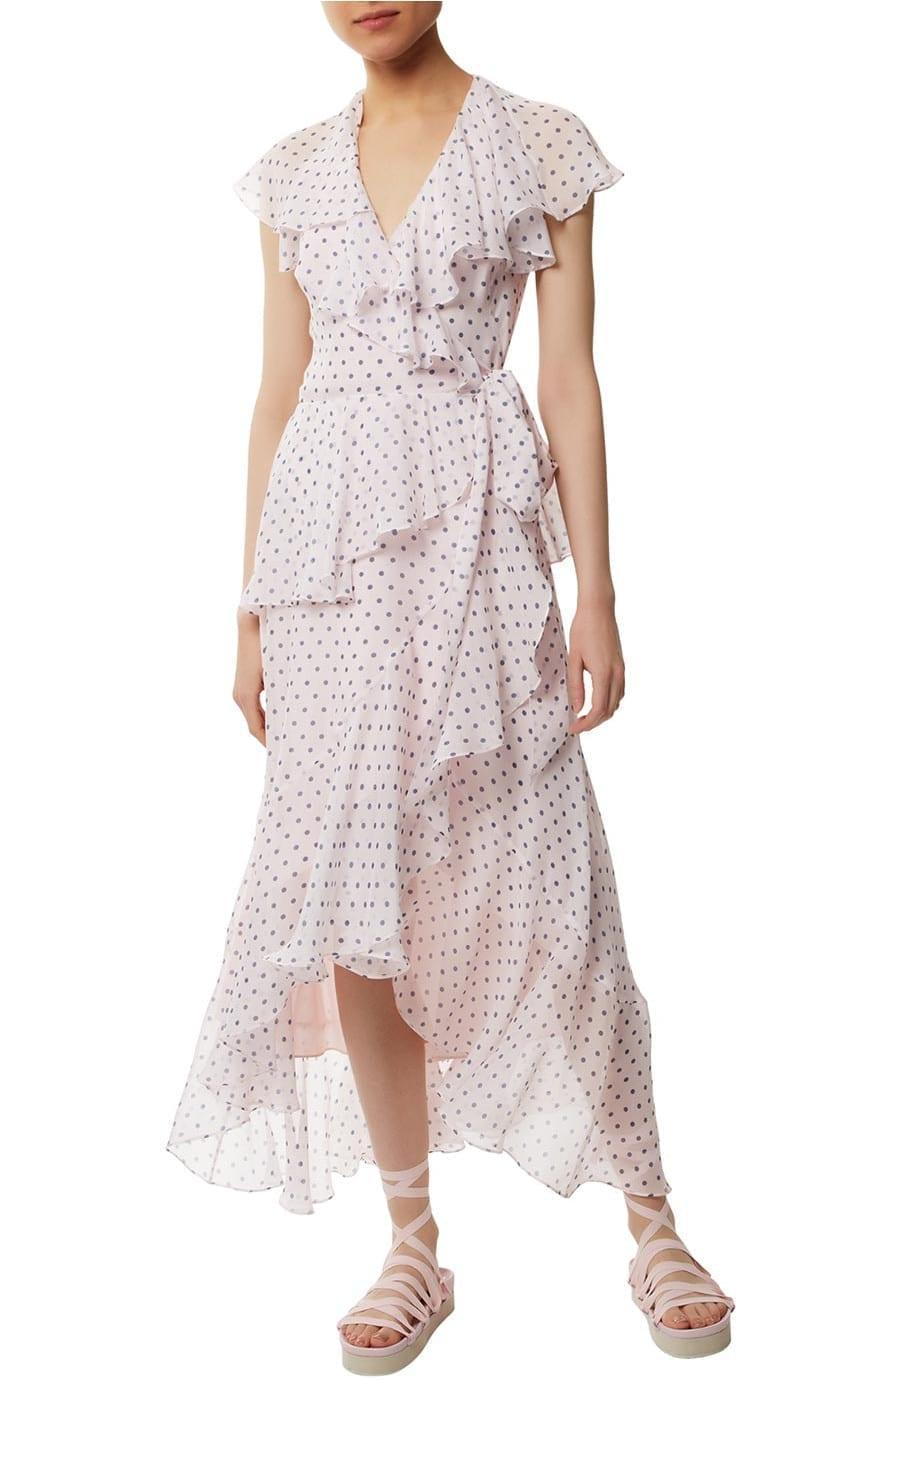 TEMPERLEY LONDON Dot Printed Nude Mix Dress